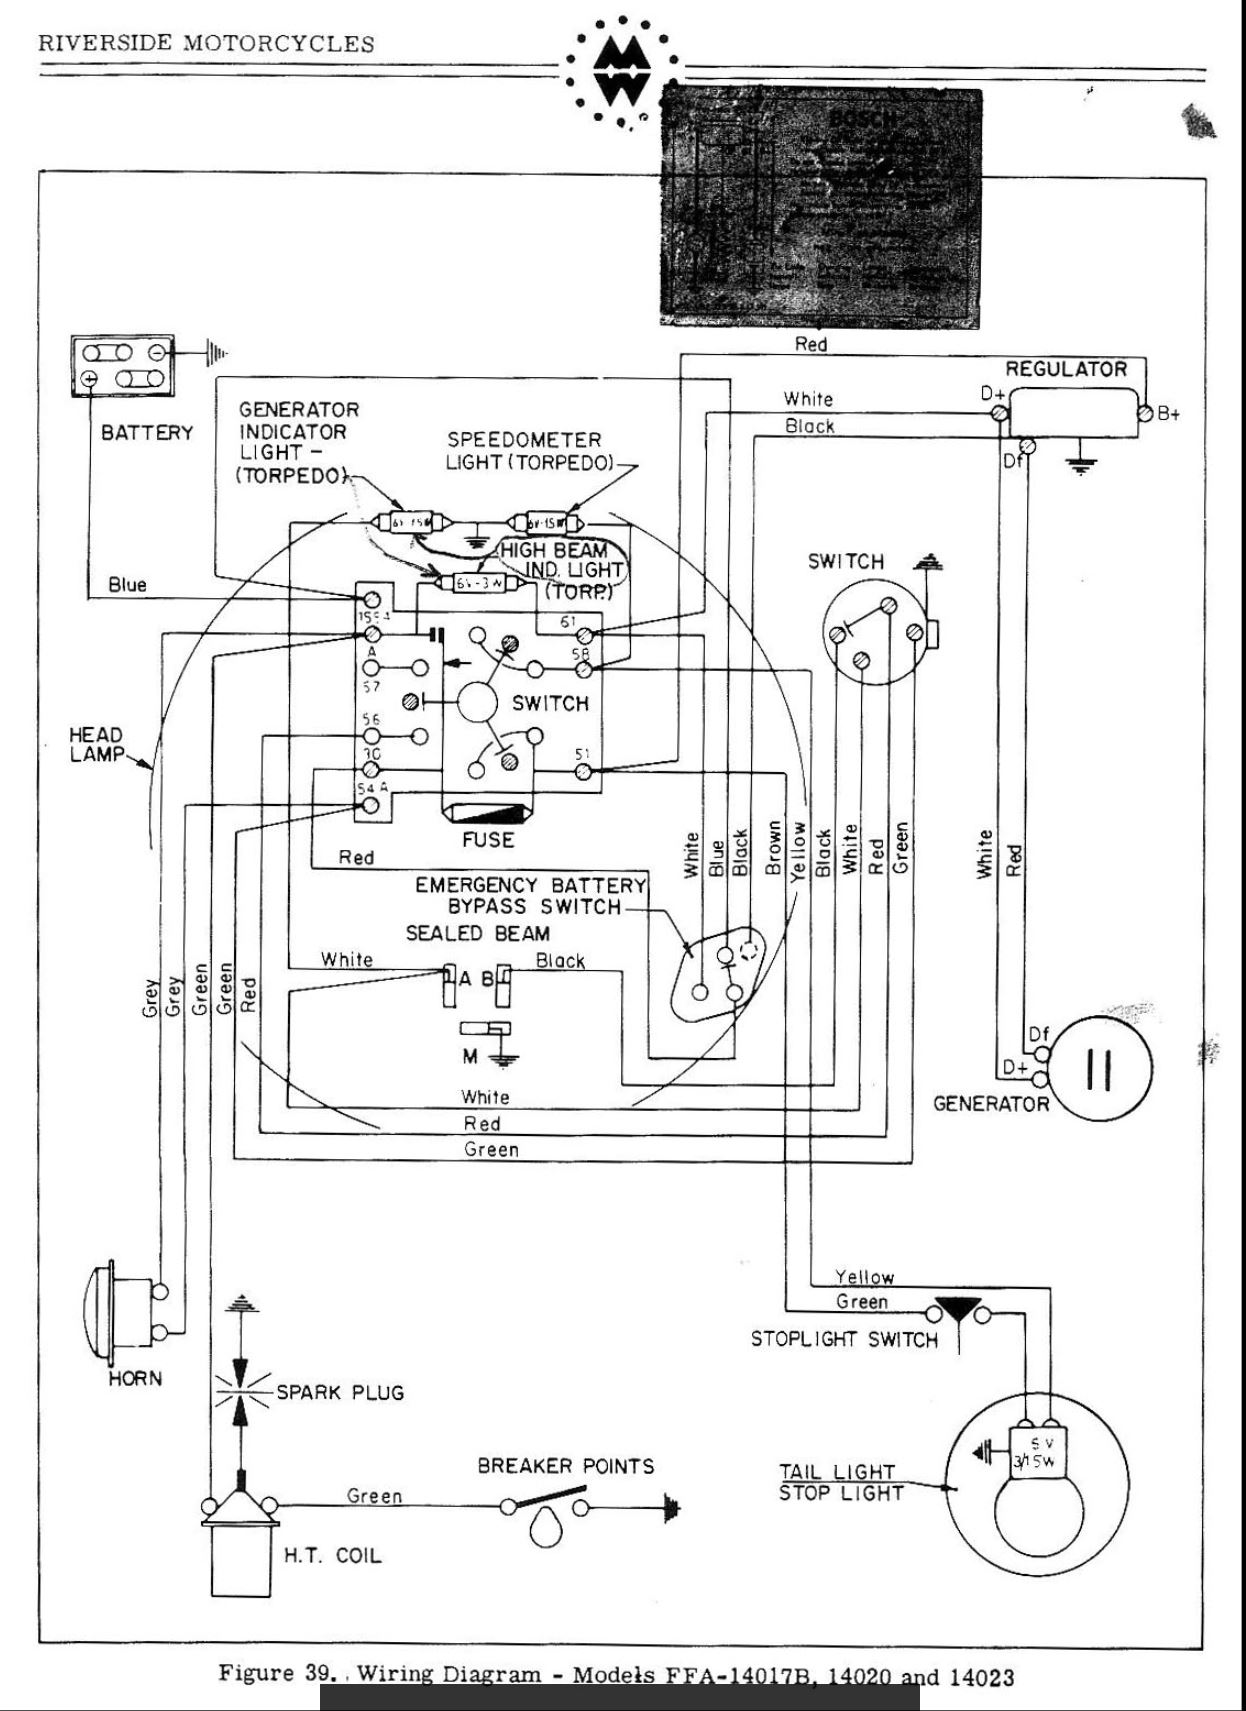 hight resolution of kawasaki mojave wiring diagram trusted wiring diagram kawasaki mojave atv wiring harness